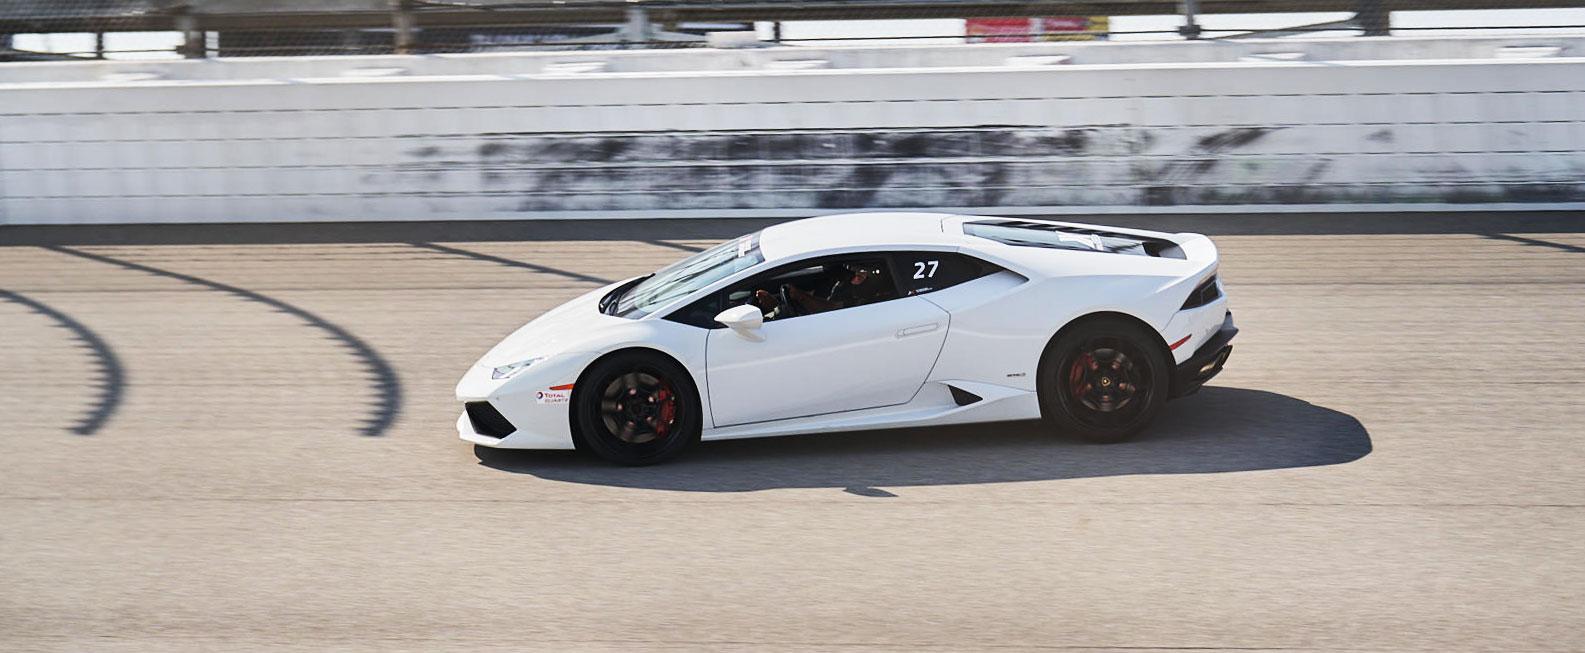 xtreme xperience racing Lamborghini driving track